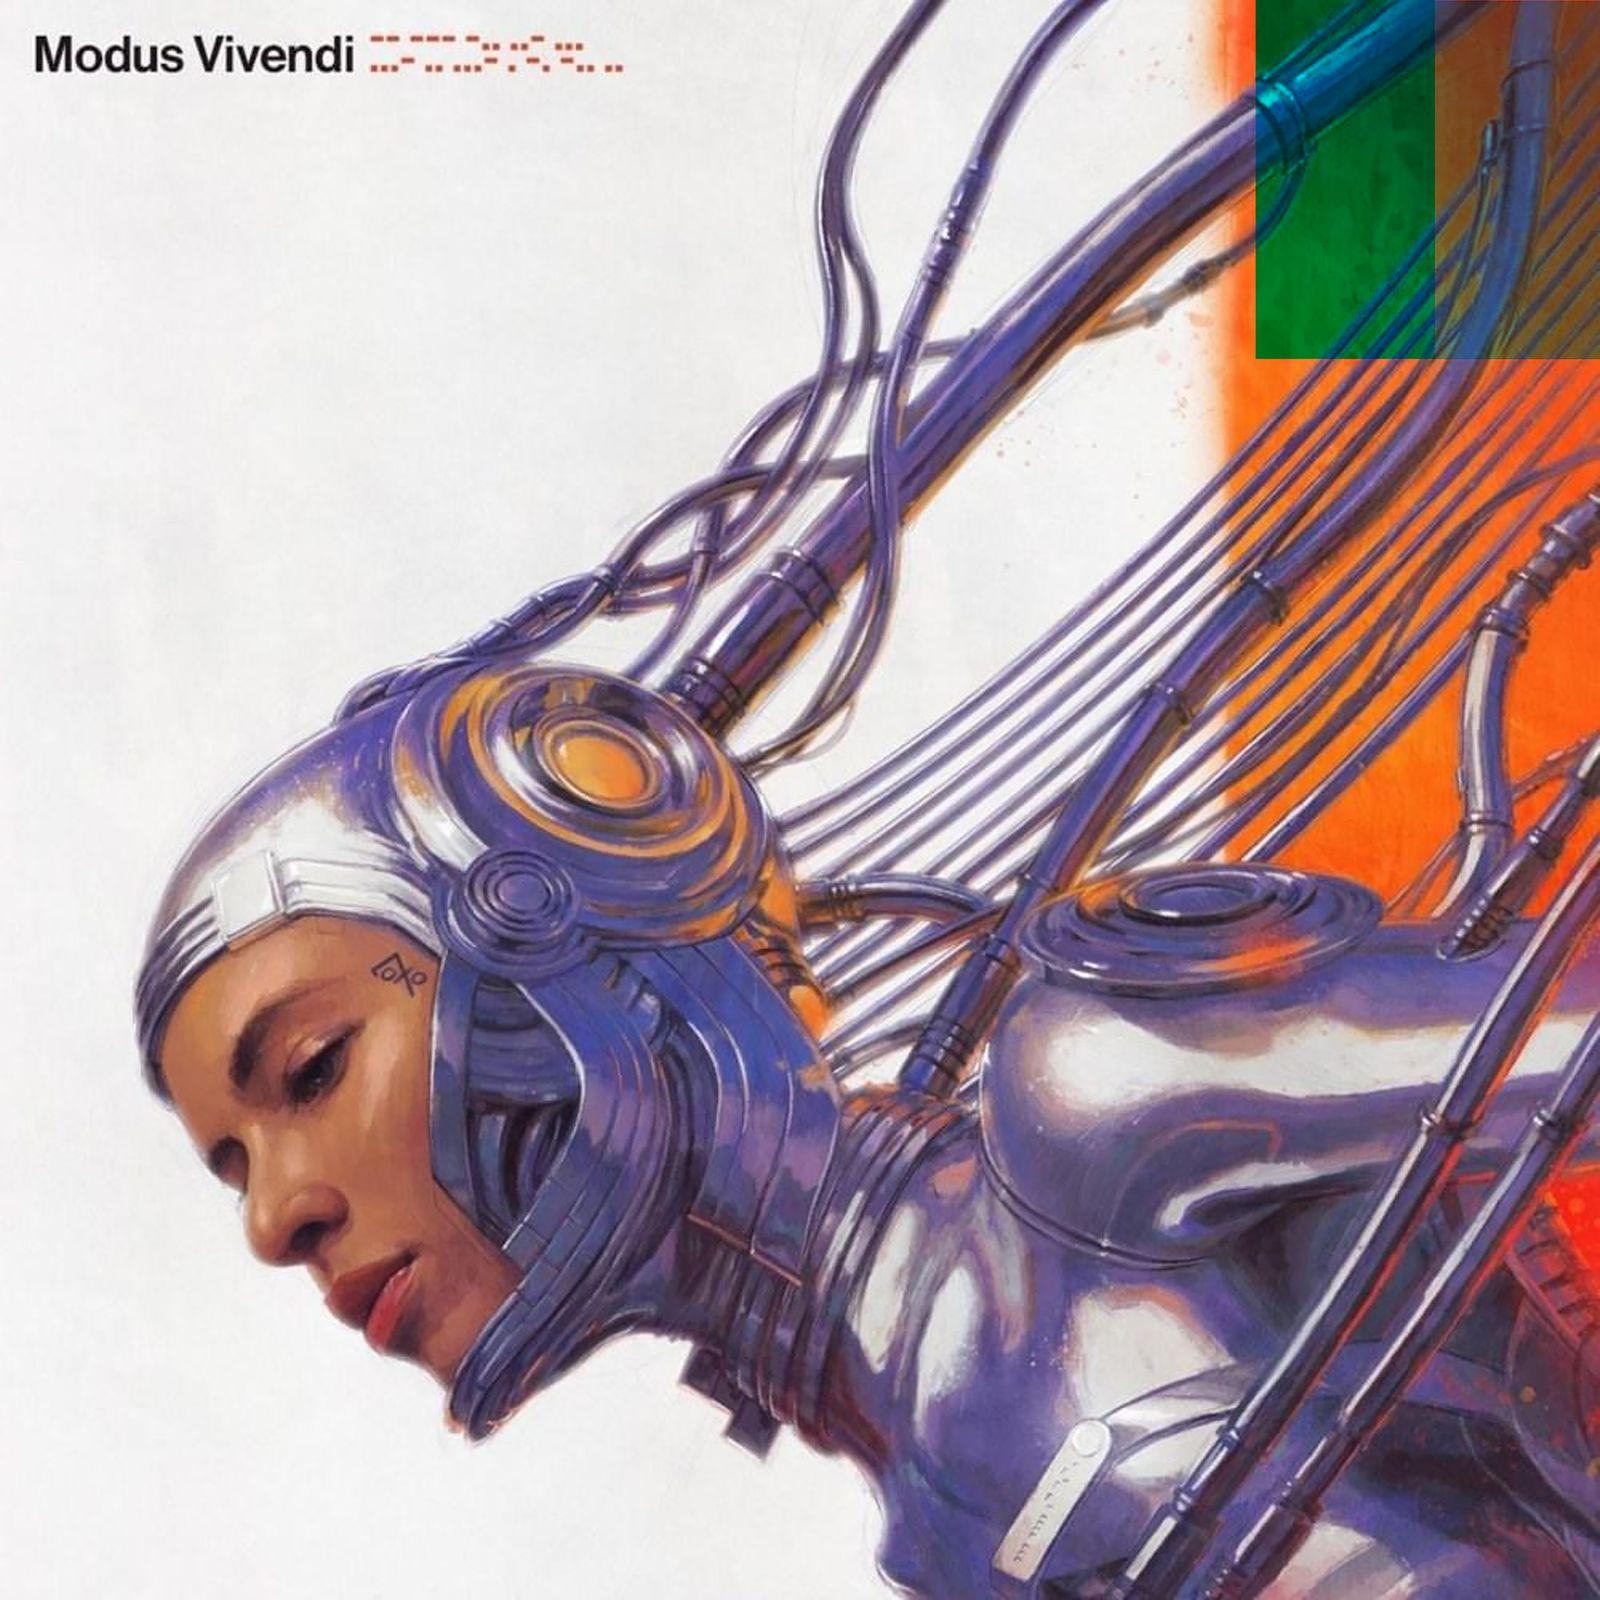 Abgehoert/ 070 Shake: Modus Vivendi COVER